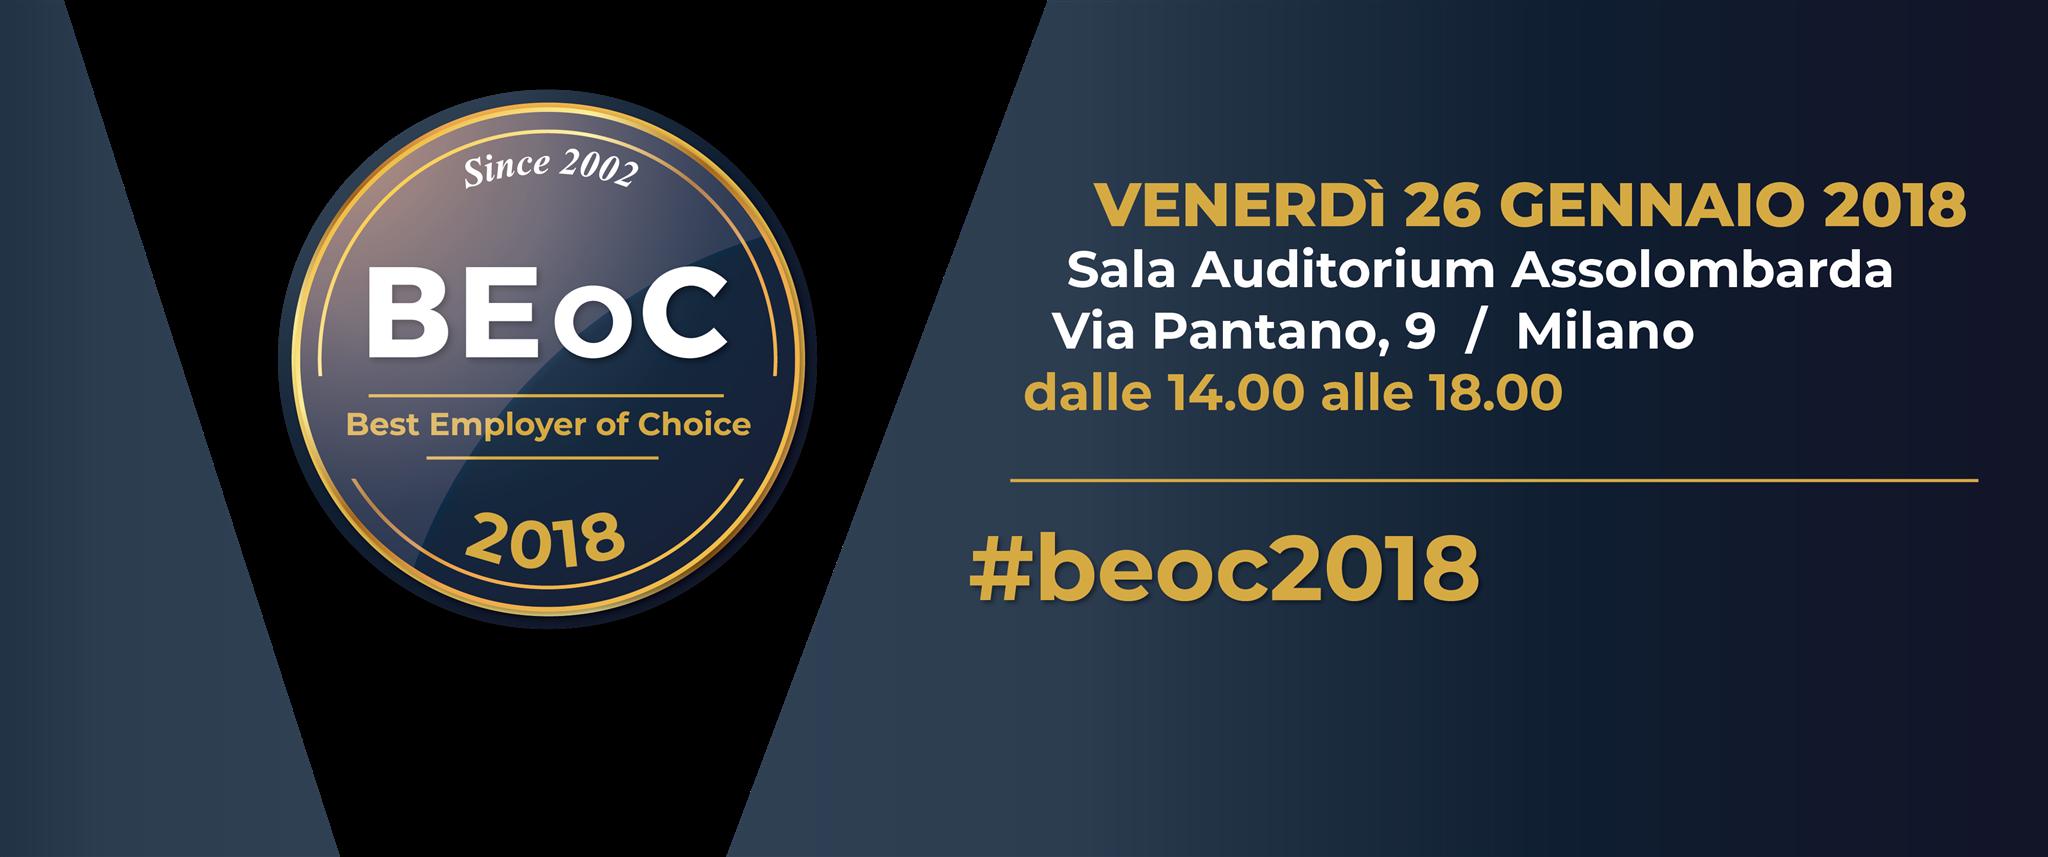 Co-design al Beoc 2018